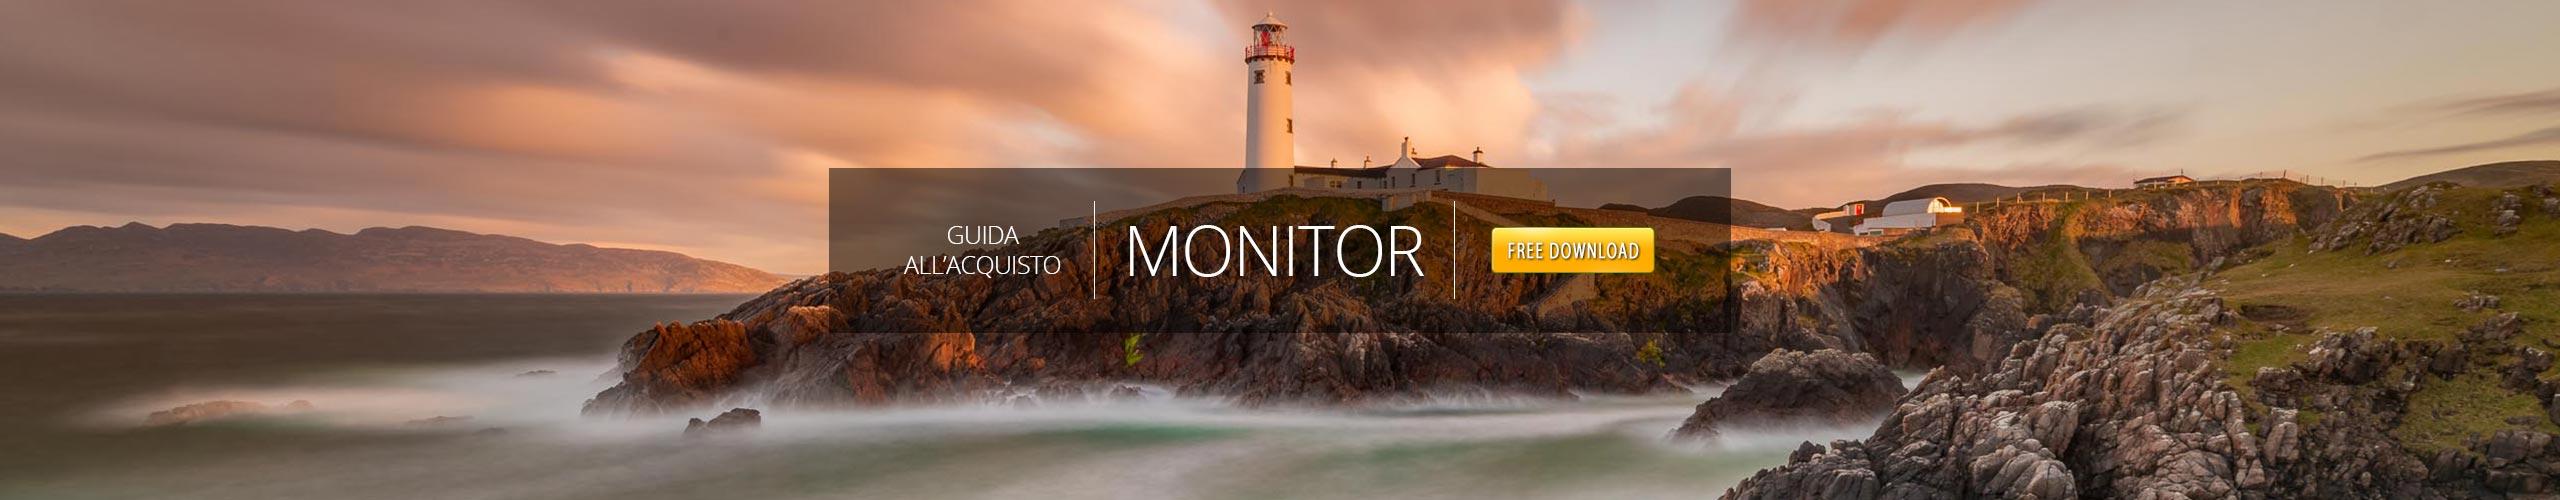 20 12 01 Banner Guida Monitor